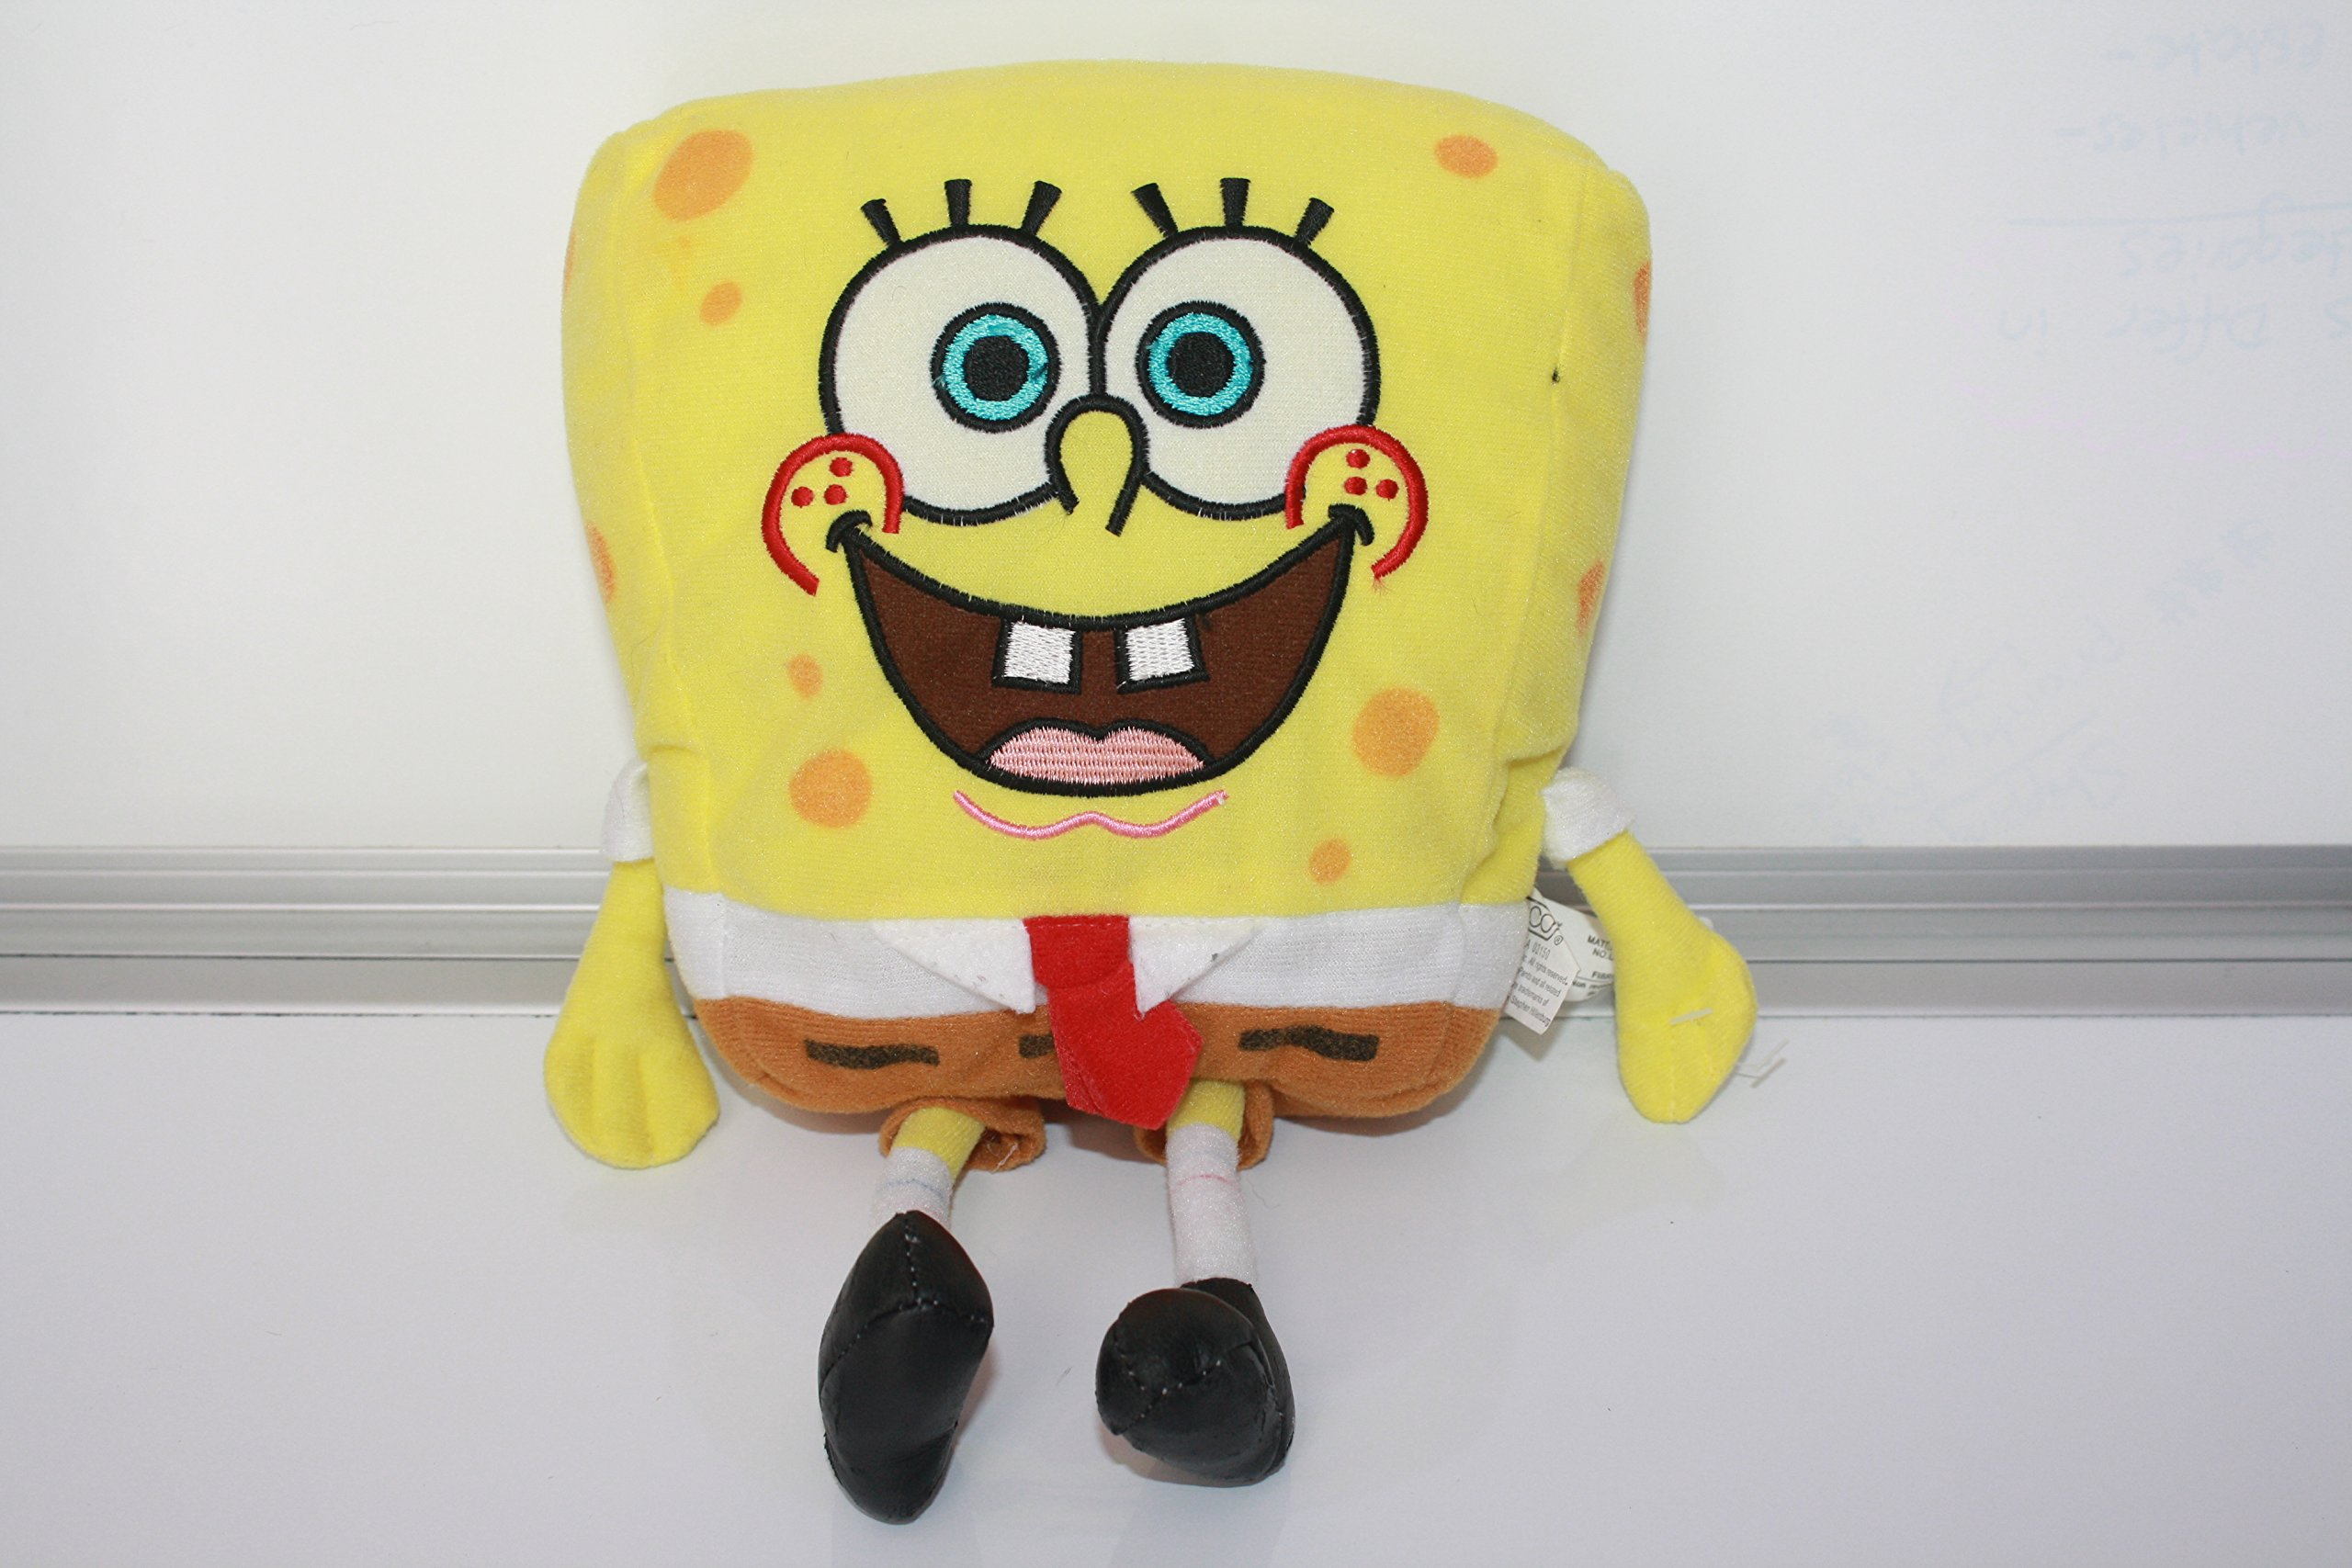 Spongebob Squarepants Plush Doll Toy 13''